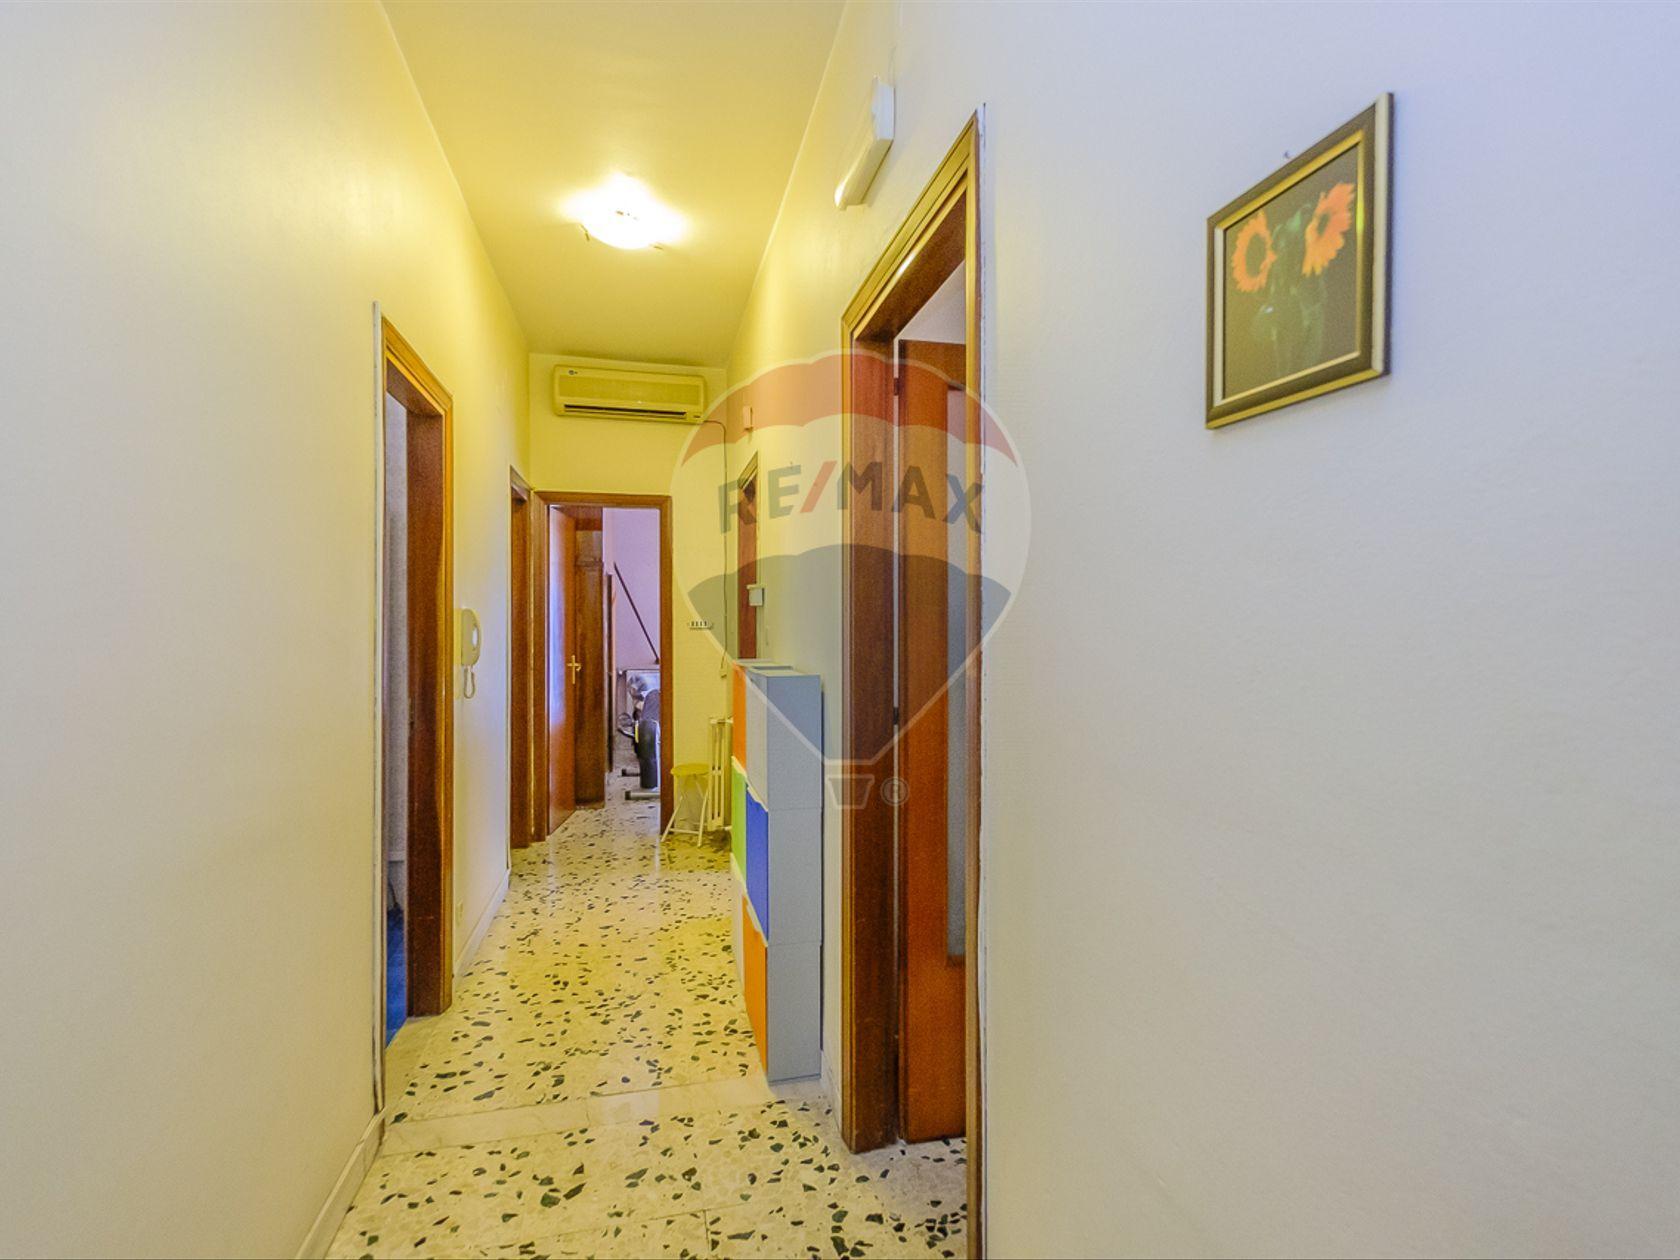 Appartamento Siracusa- Scala Greca S. Panagia Teracati Zecchino, Siracusa, SR Vendita - Foto 22